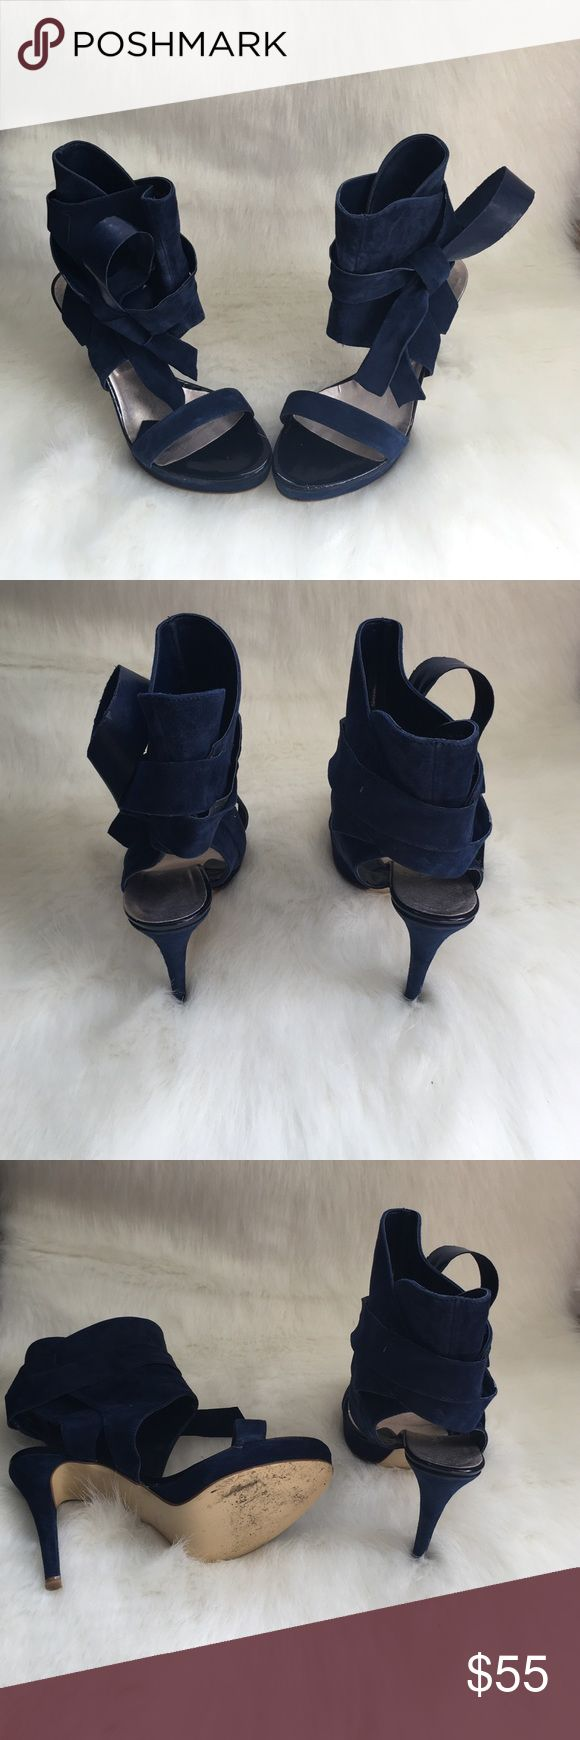 Vera Pelle Vera Pelle shoes size 40 bur runs small. Fits 39. Pre-owned. Vera Pelle Shoes Heels